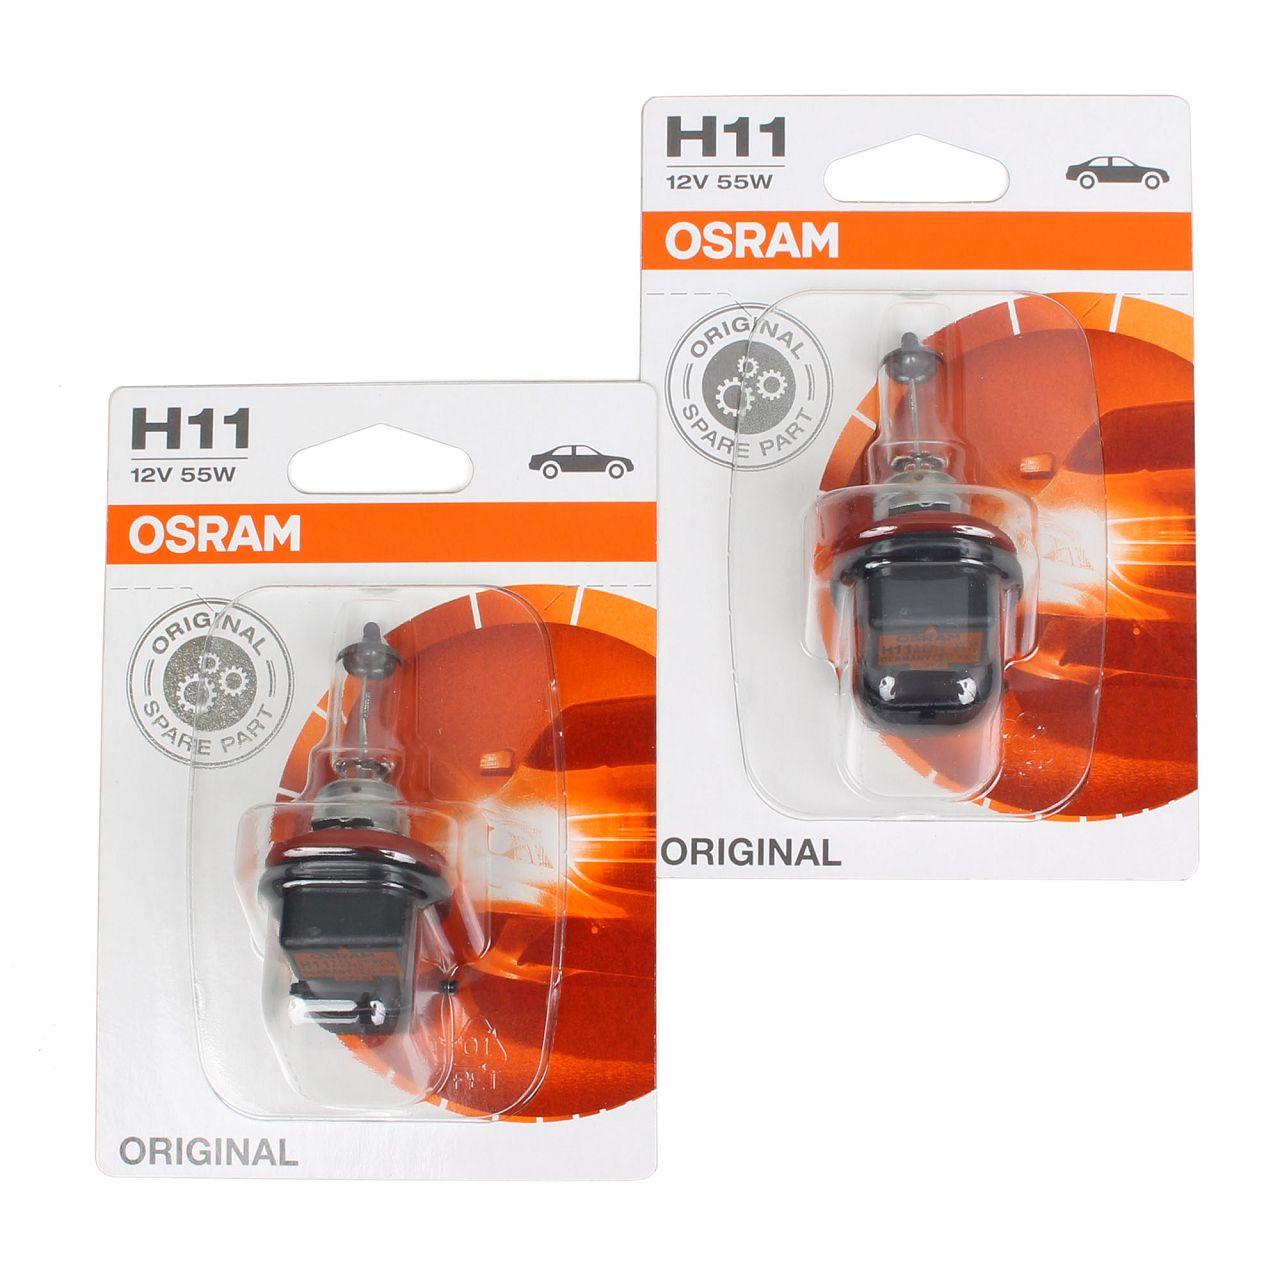 2x OSRAM Halogenlampe H11 ORIGINAL LINE 12V 55W PGJ19-2 64211-01B